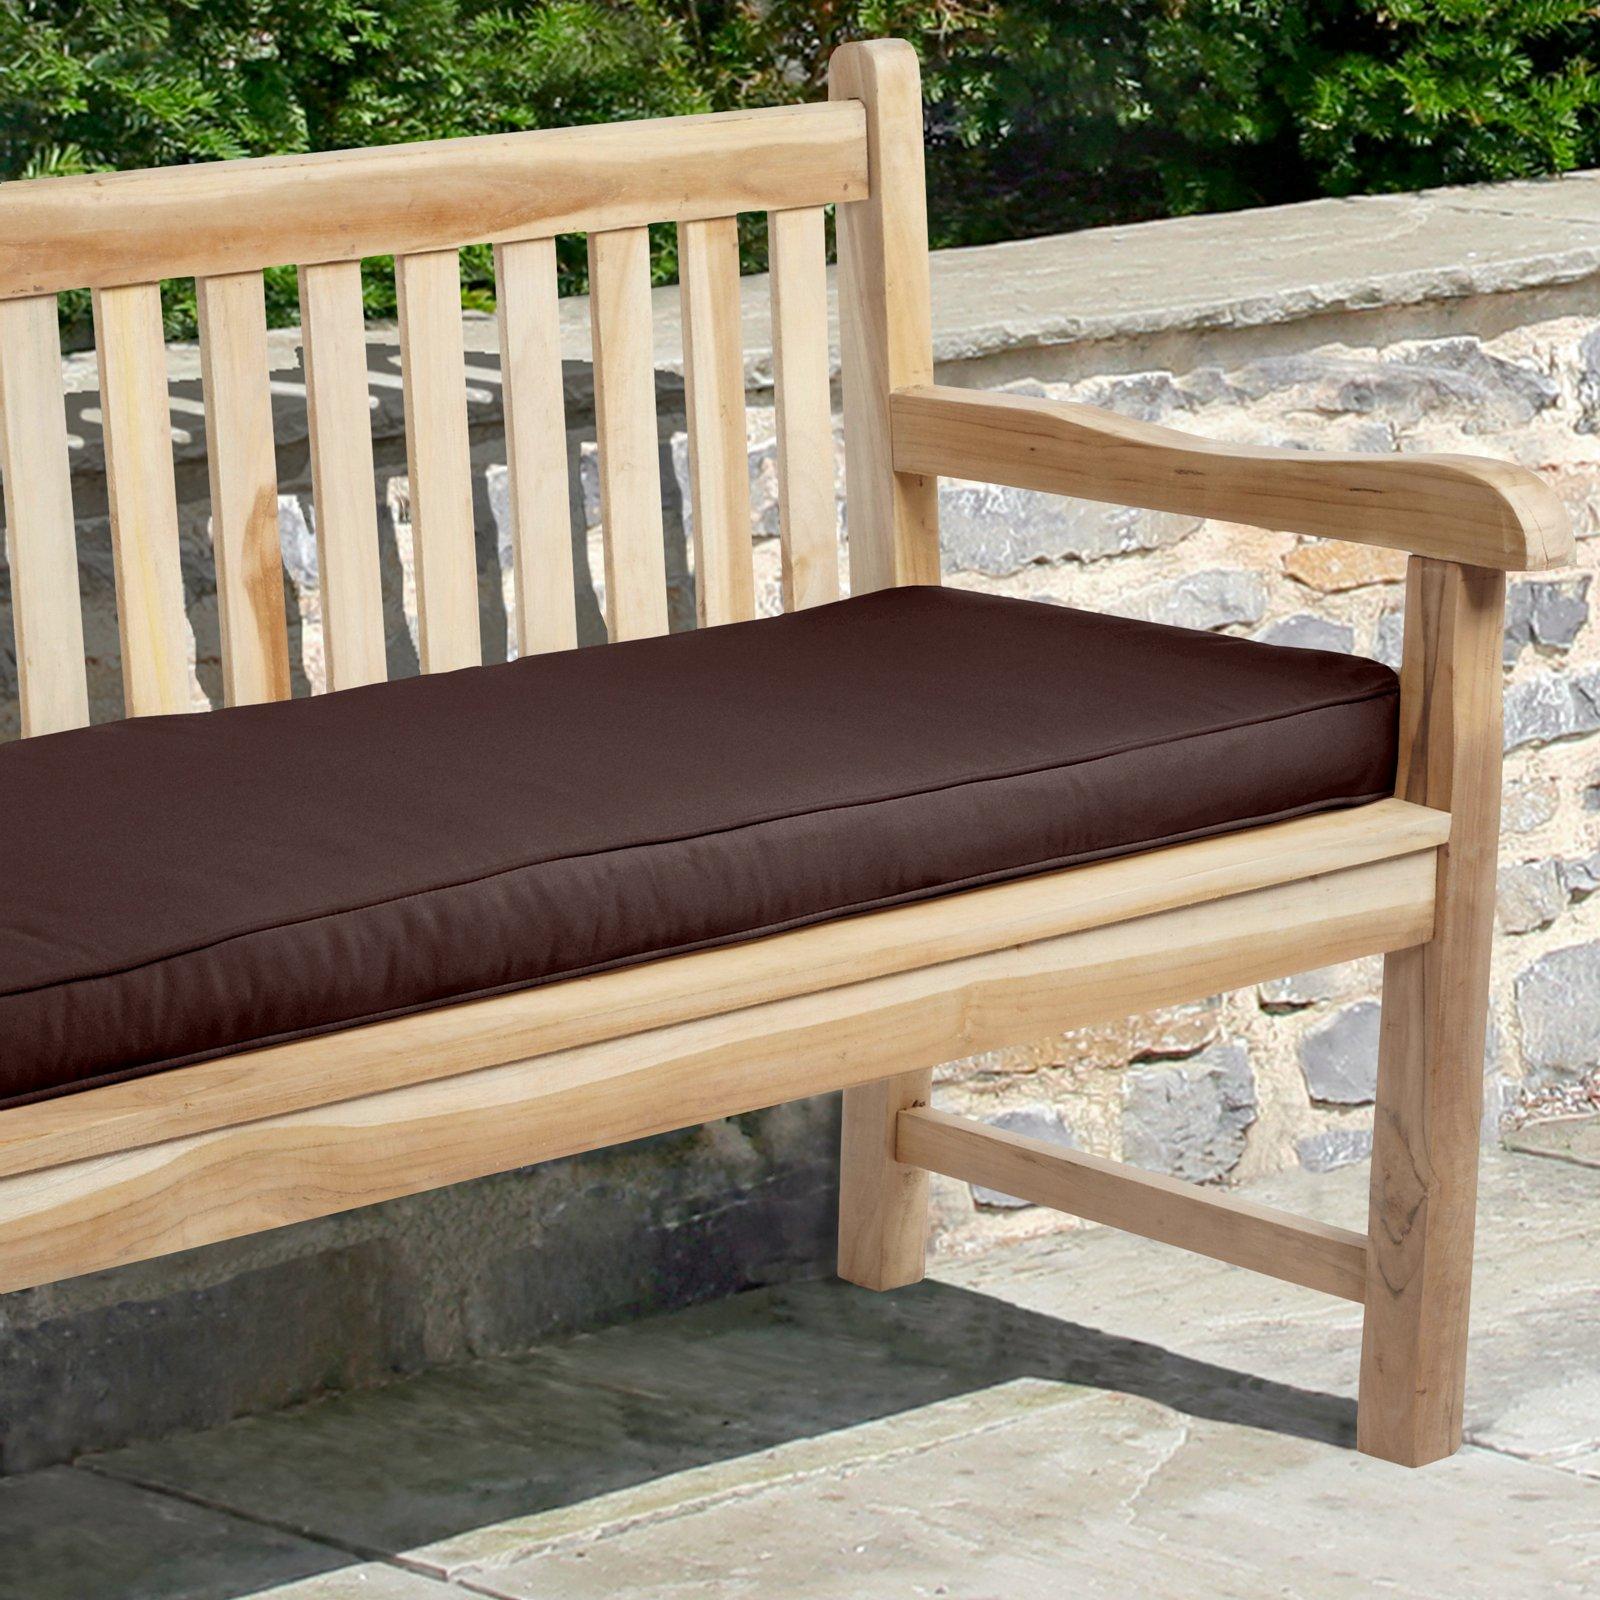 Mozaic Company 48 X 19 In Sunbrella Solid Outdoor Bench Cushion